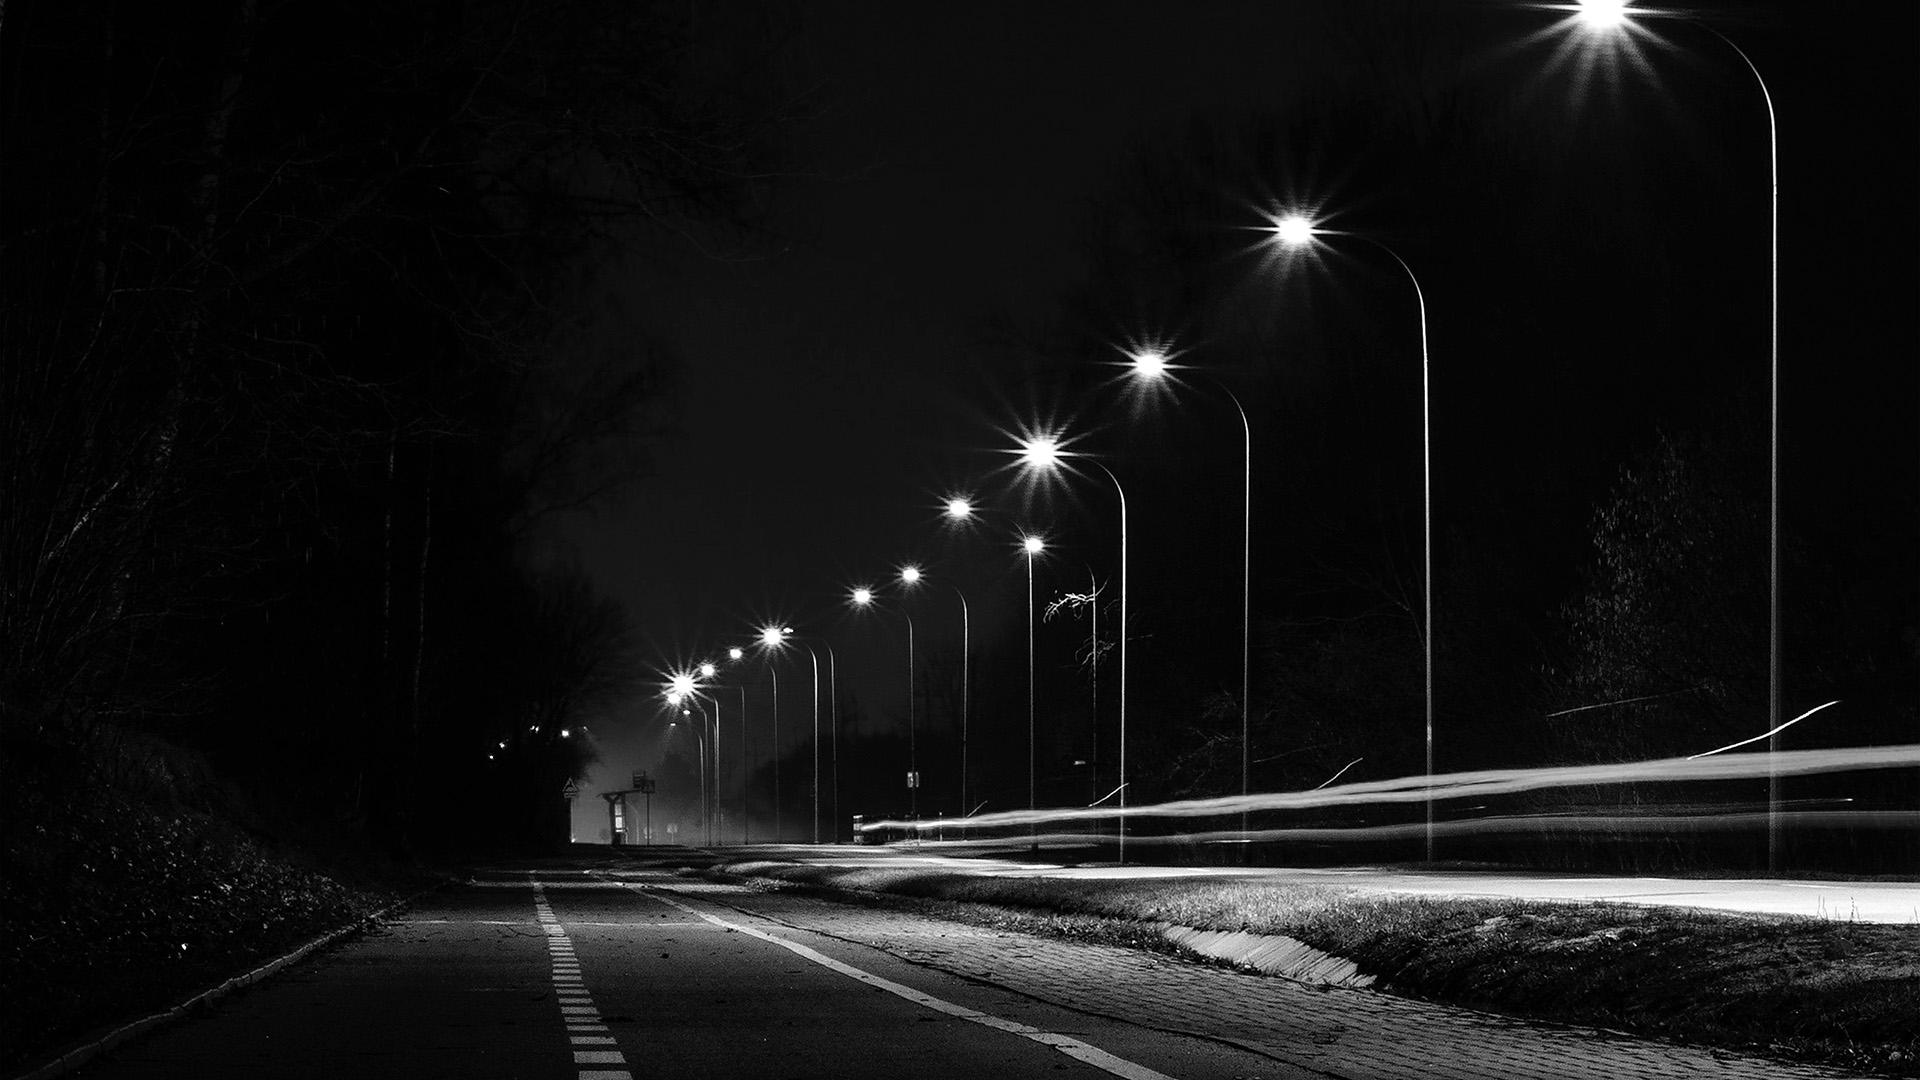 Mx29 Street Lights Dark Night Car City Bw Wallpaper